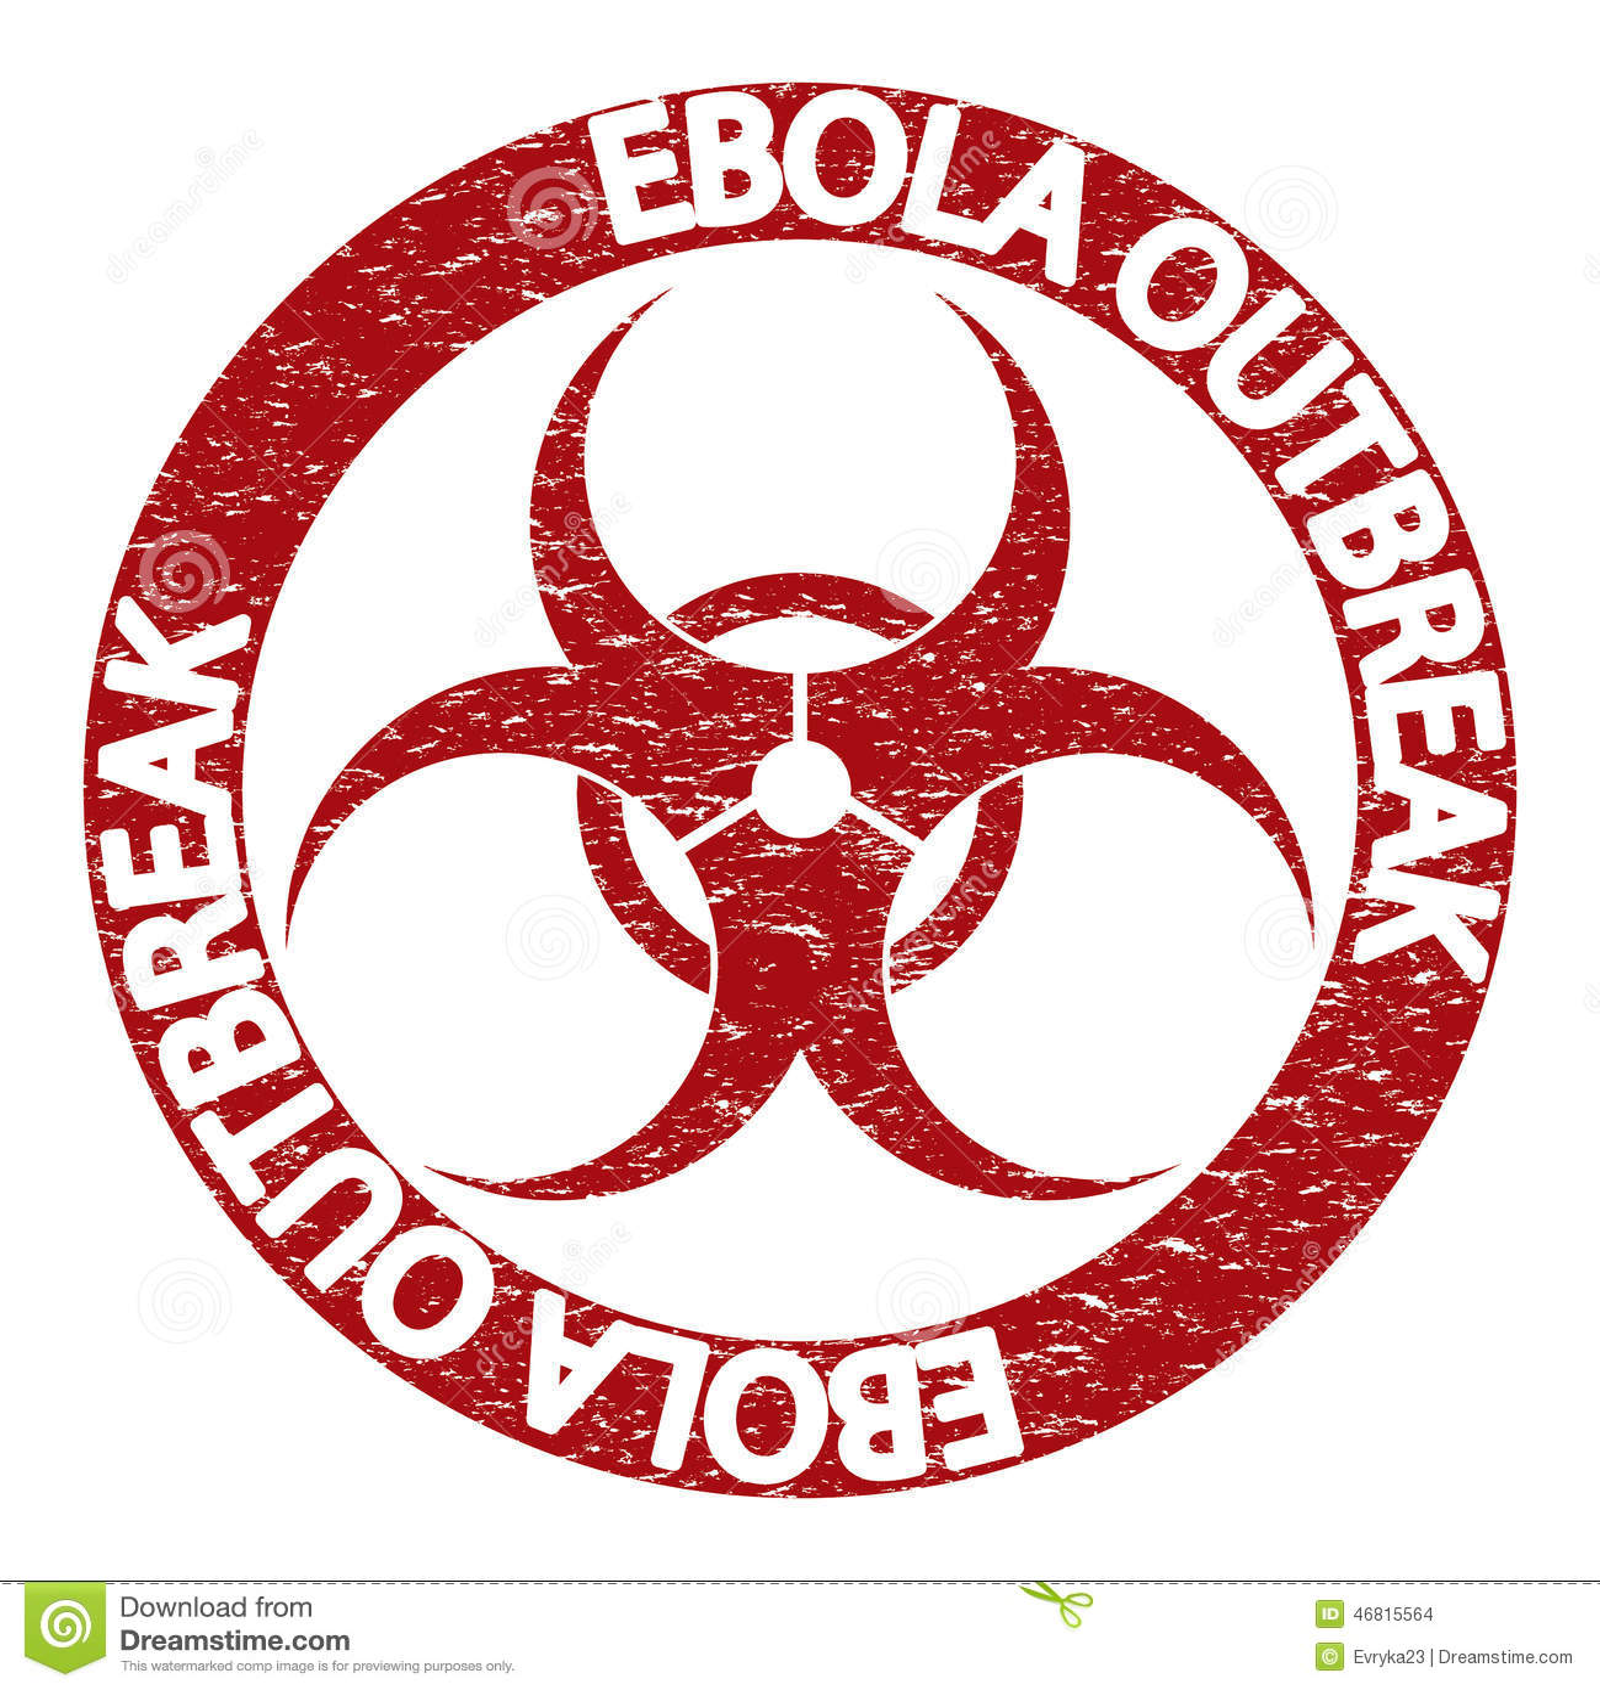 Ebola Virus Abstract Grunge Alert Stock Vector Illustration Of